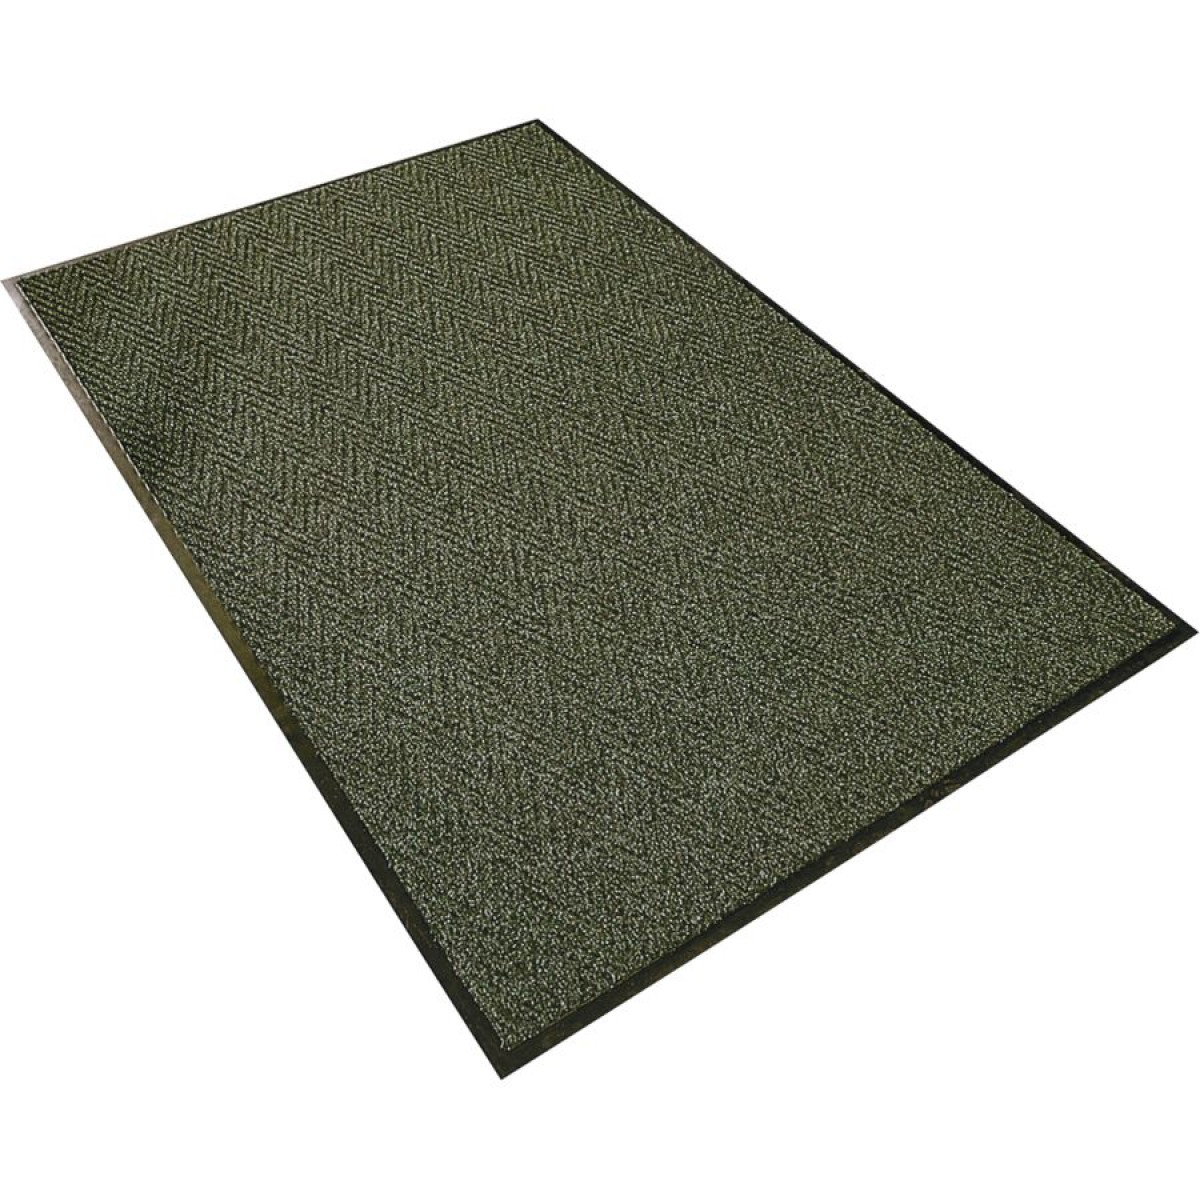 tapis d 39 entr e absorbant antistatique 90cm x 1 5m hse center. Black Bedroom Furniture Sets. Home Design Ideas